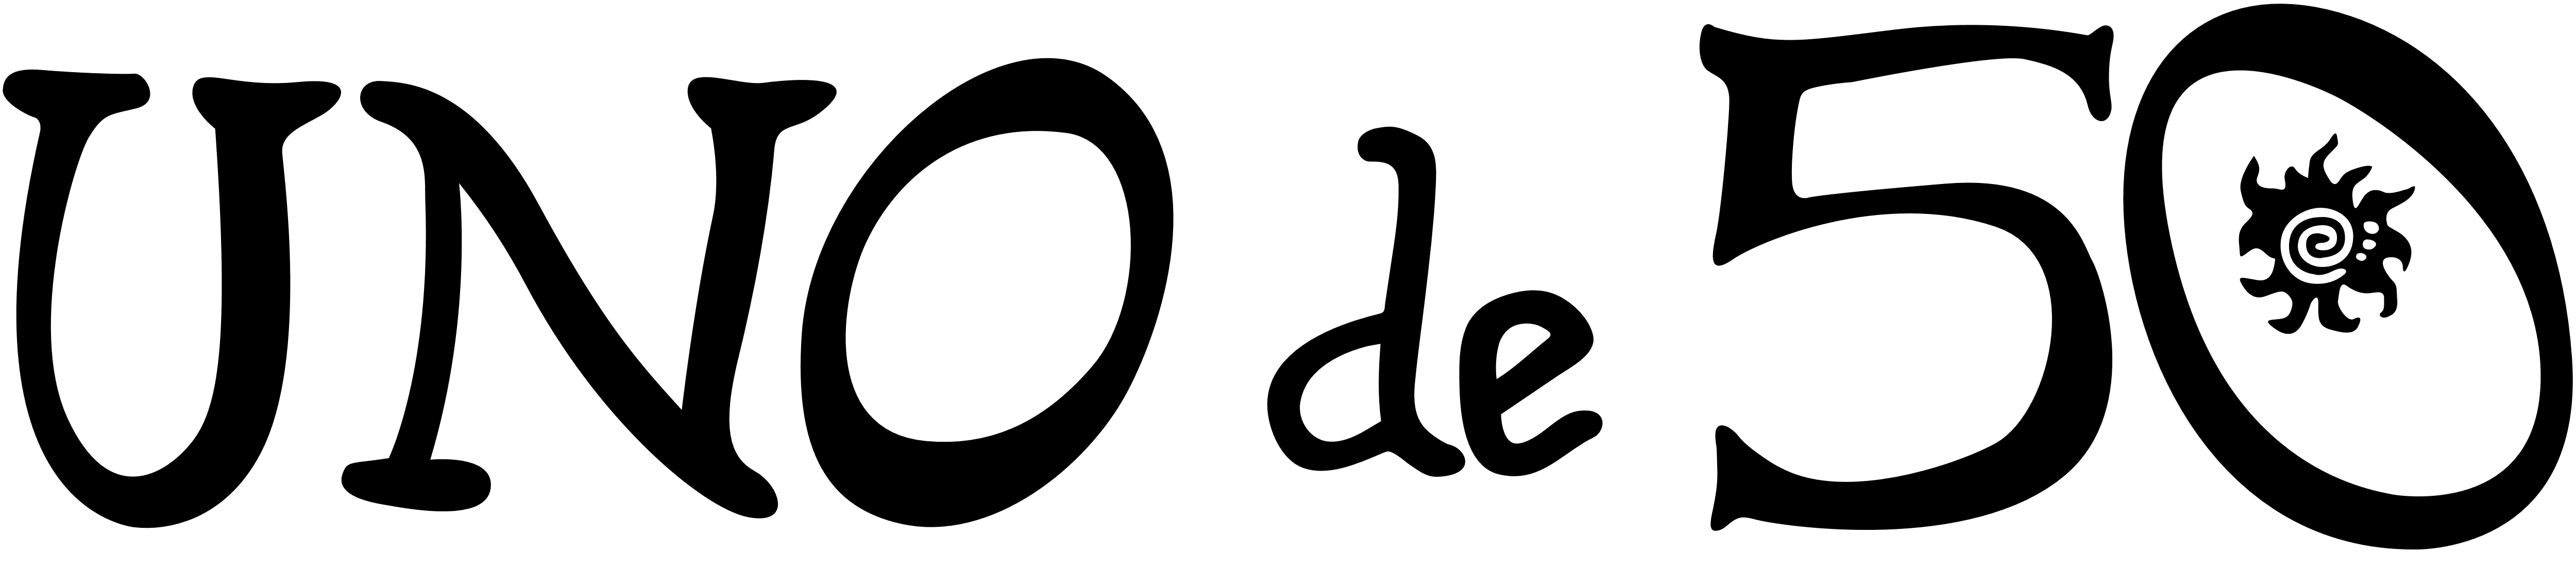 download Noetherian Semigroup